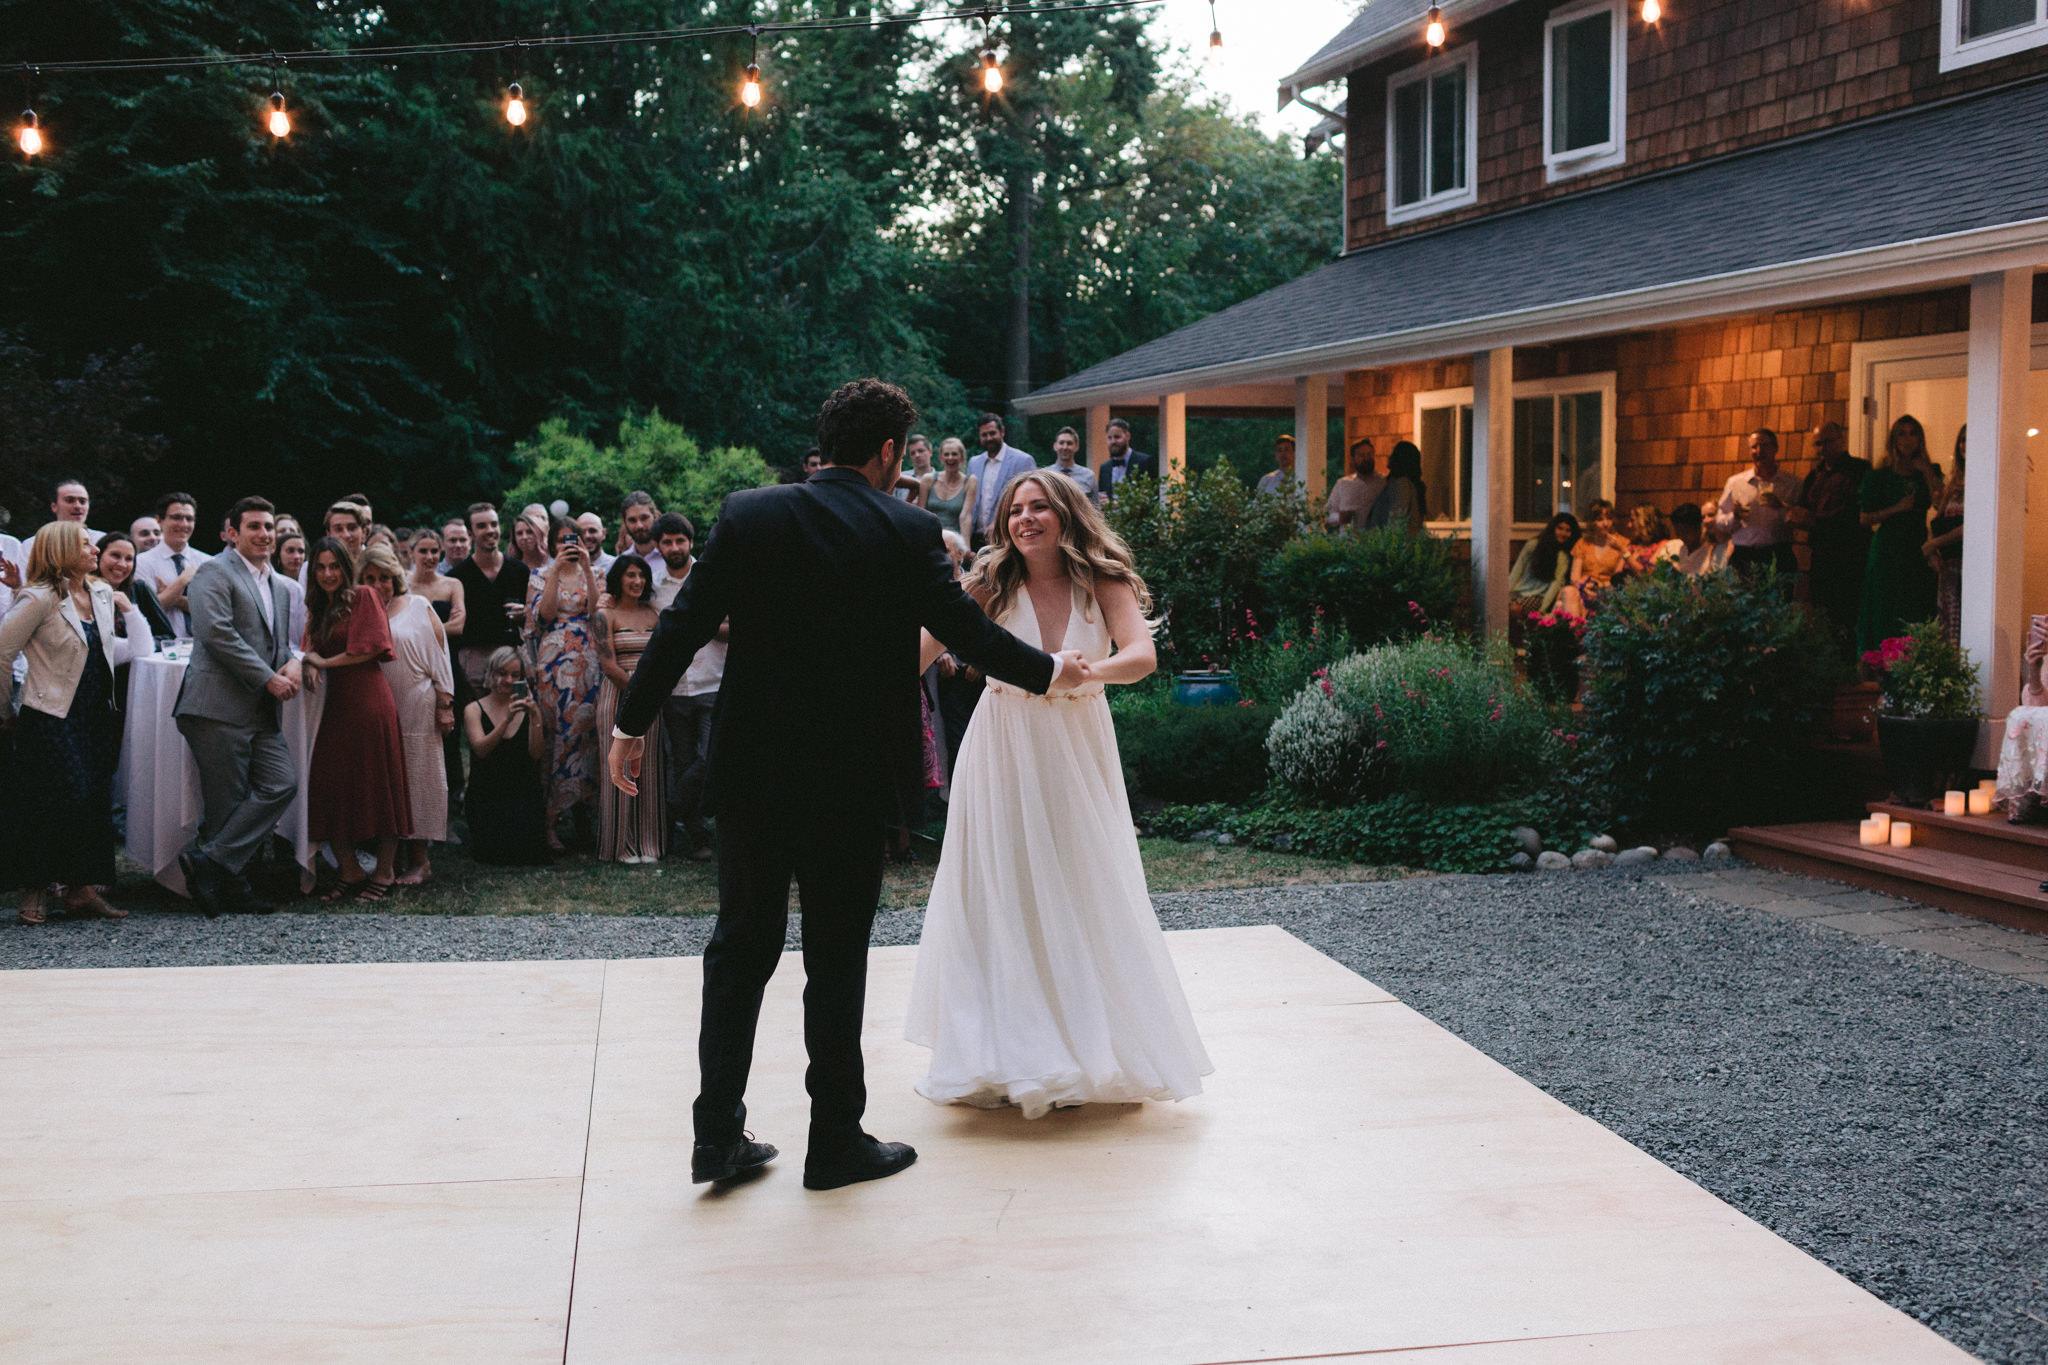 Backyard-Bainbridge-Island-Wedding-Alycia-Lovell-Photography-228.JPG